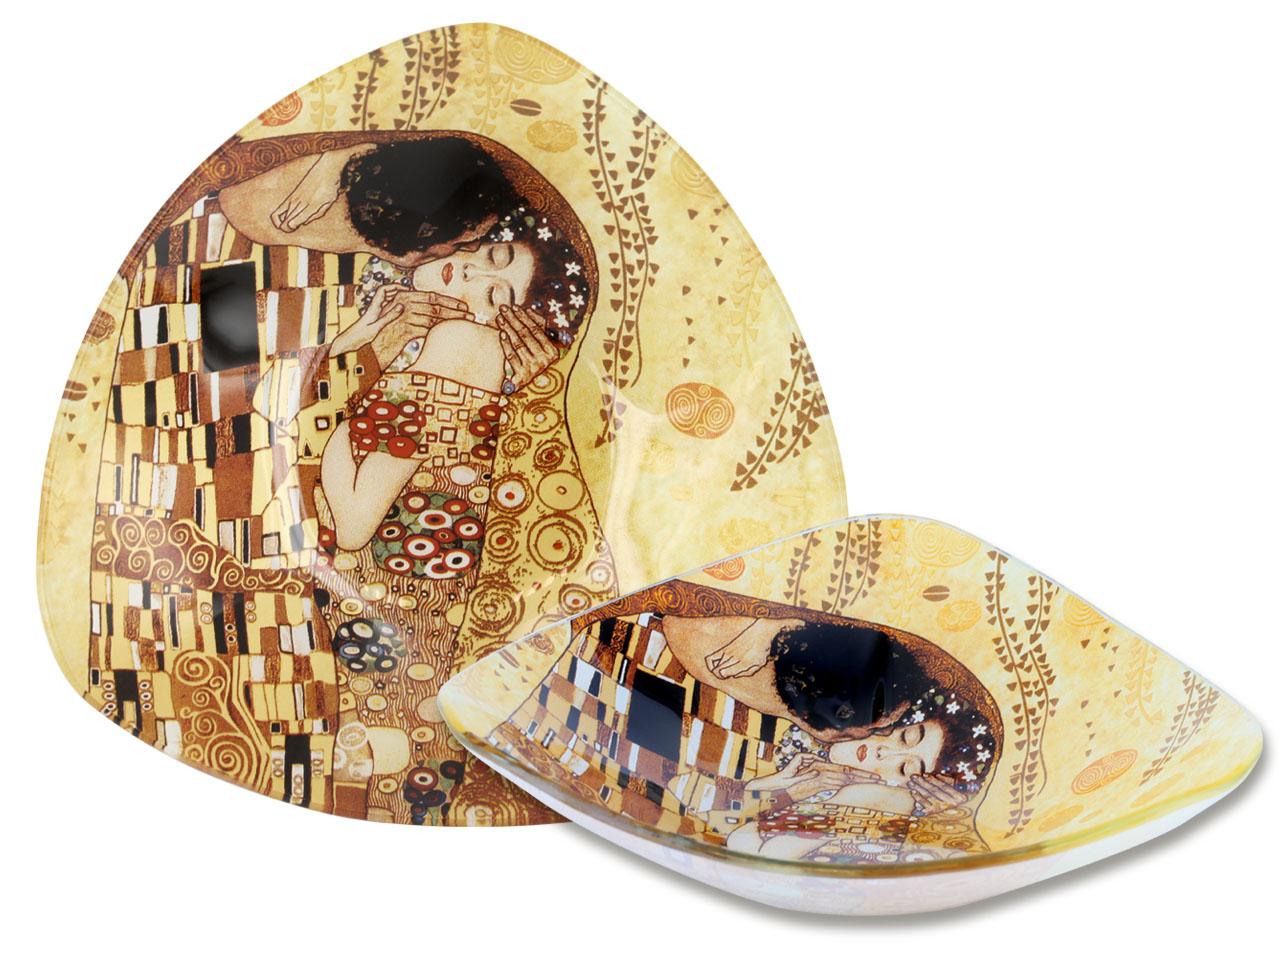 Mestres da pintura - Klimt- O Beijo - Tigela